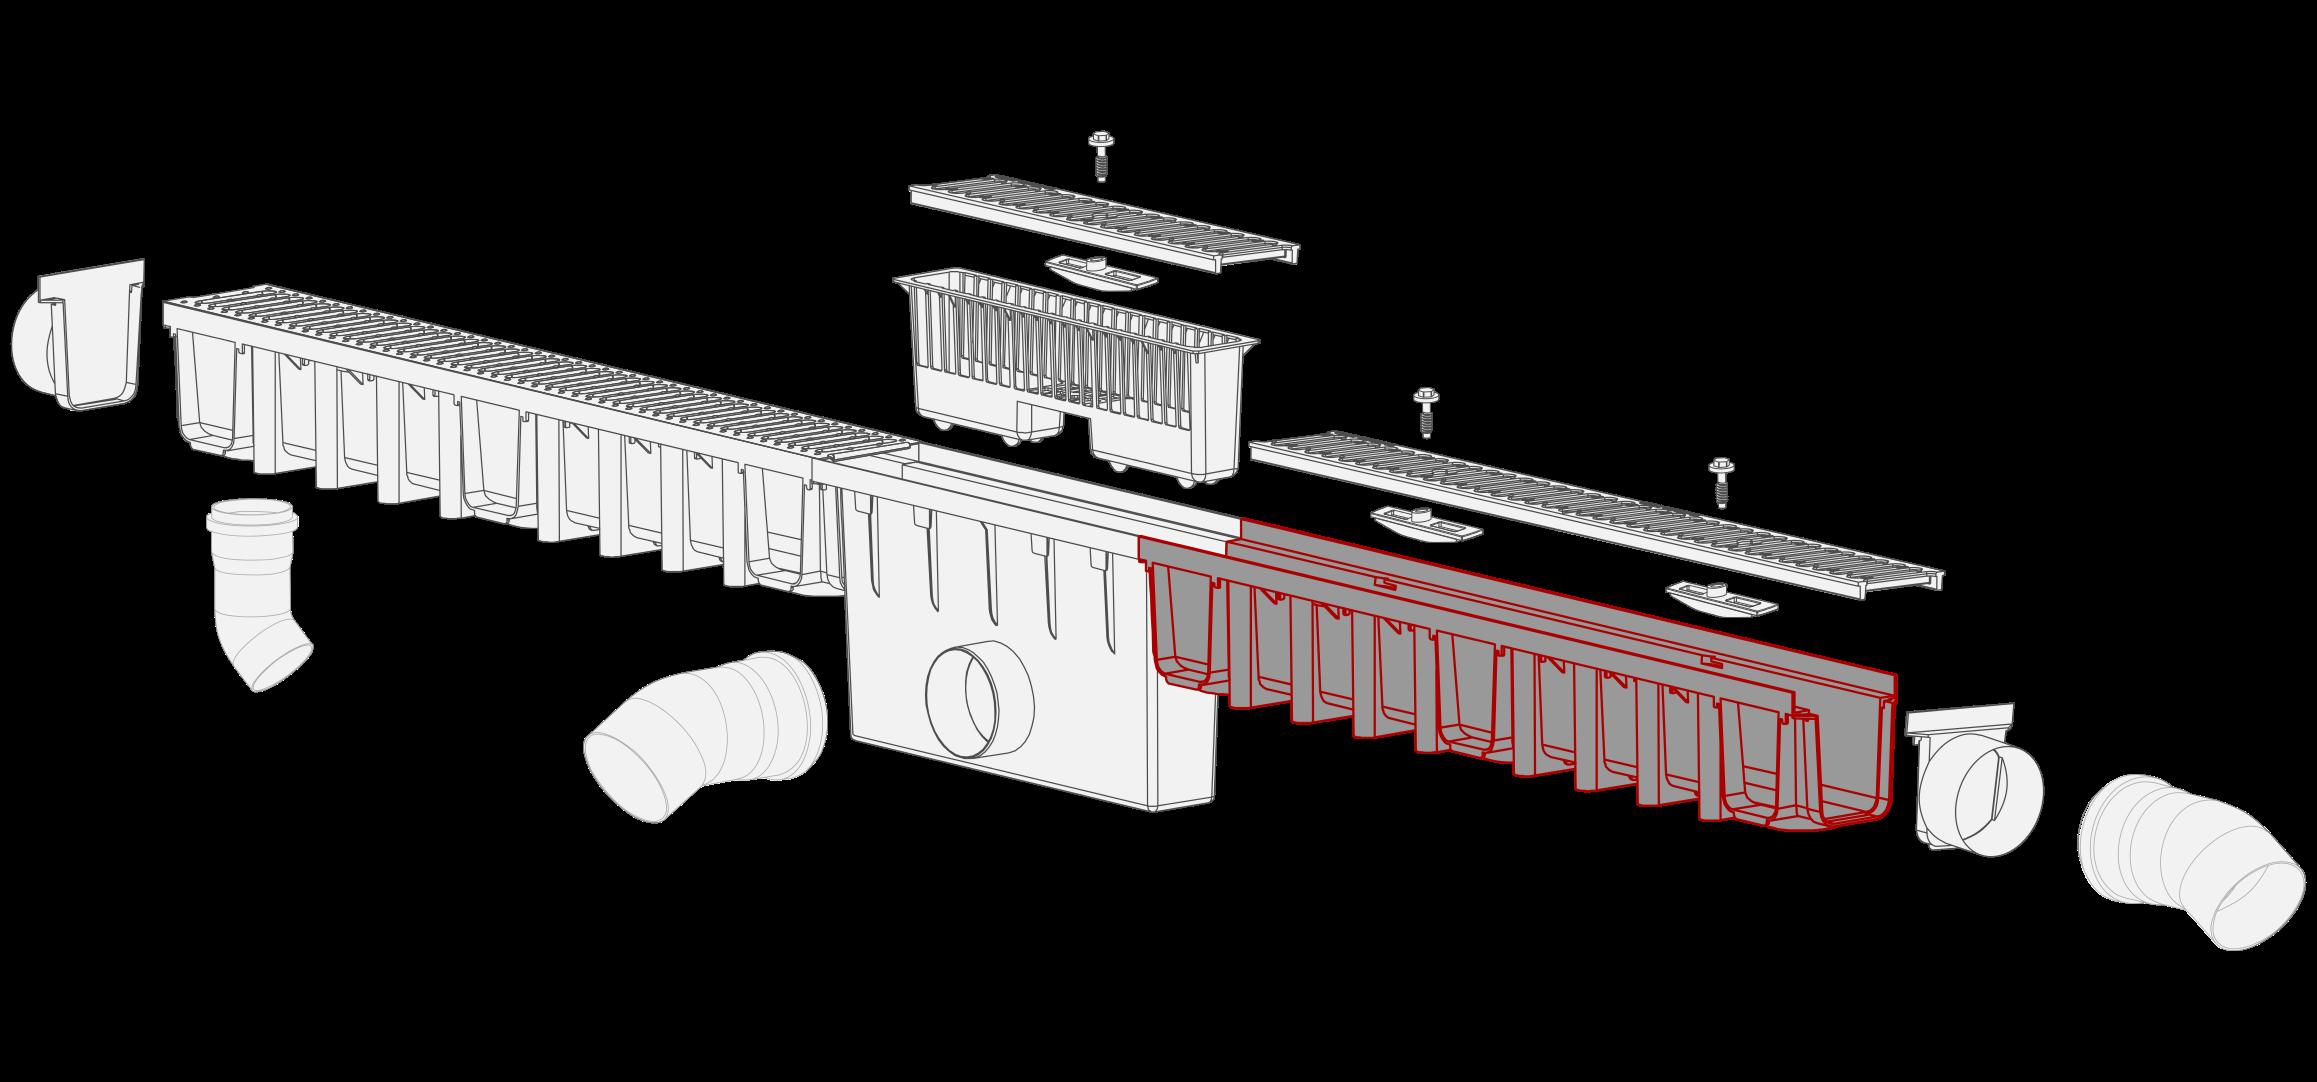 System 1000x148 kanal